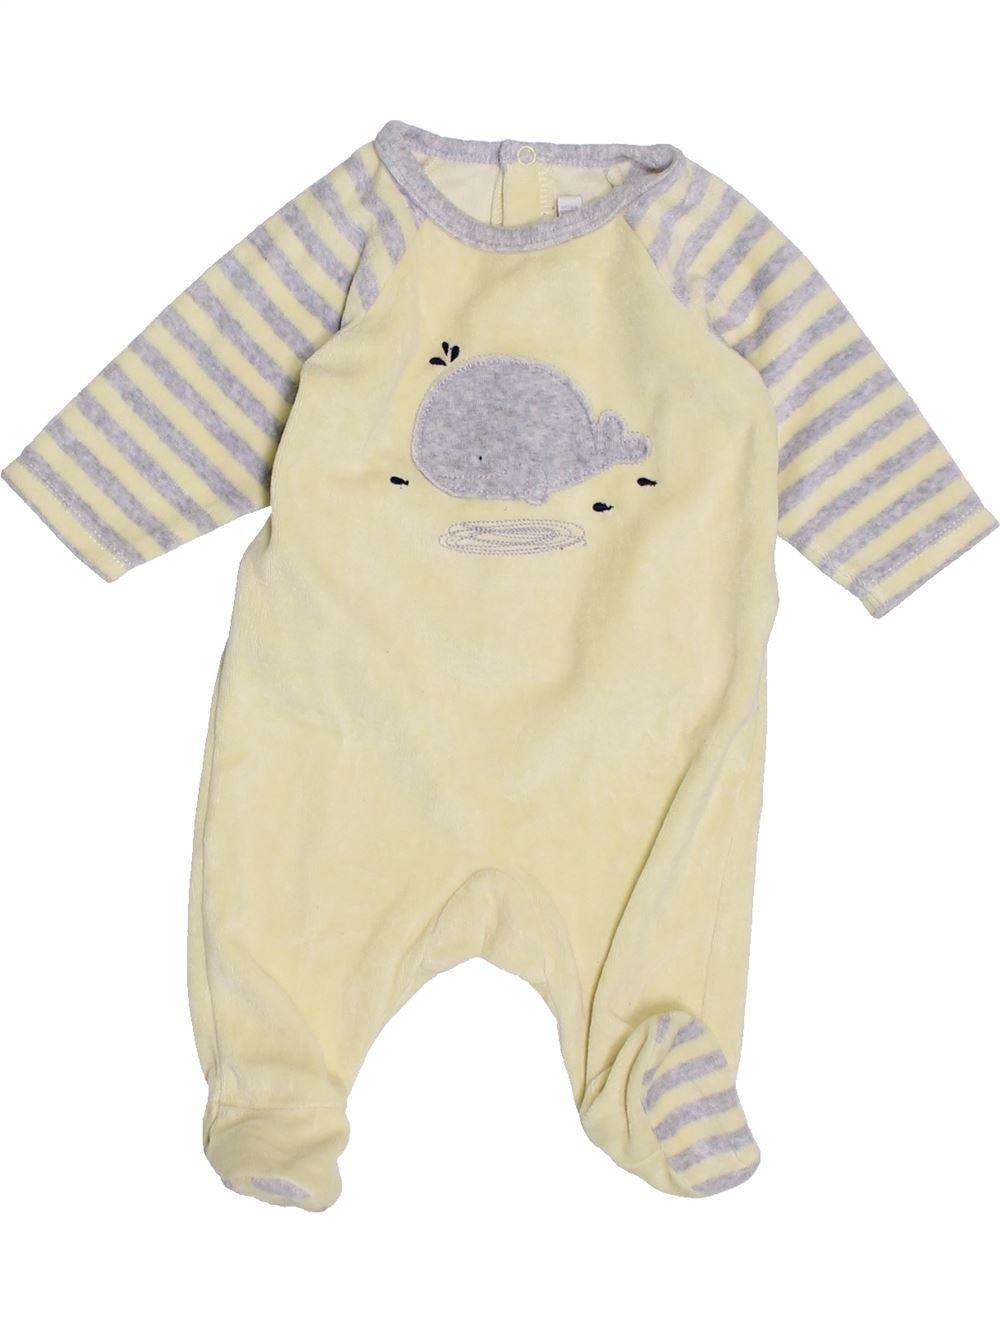 37a5cceac673a Pyjama 1 piece bleu NATALYS du 3 mois pour Fille ou Garcon - 1389490